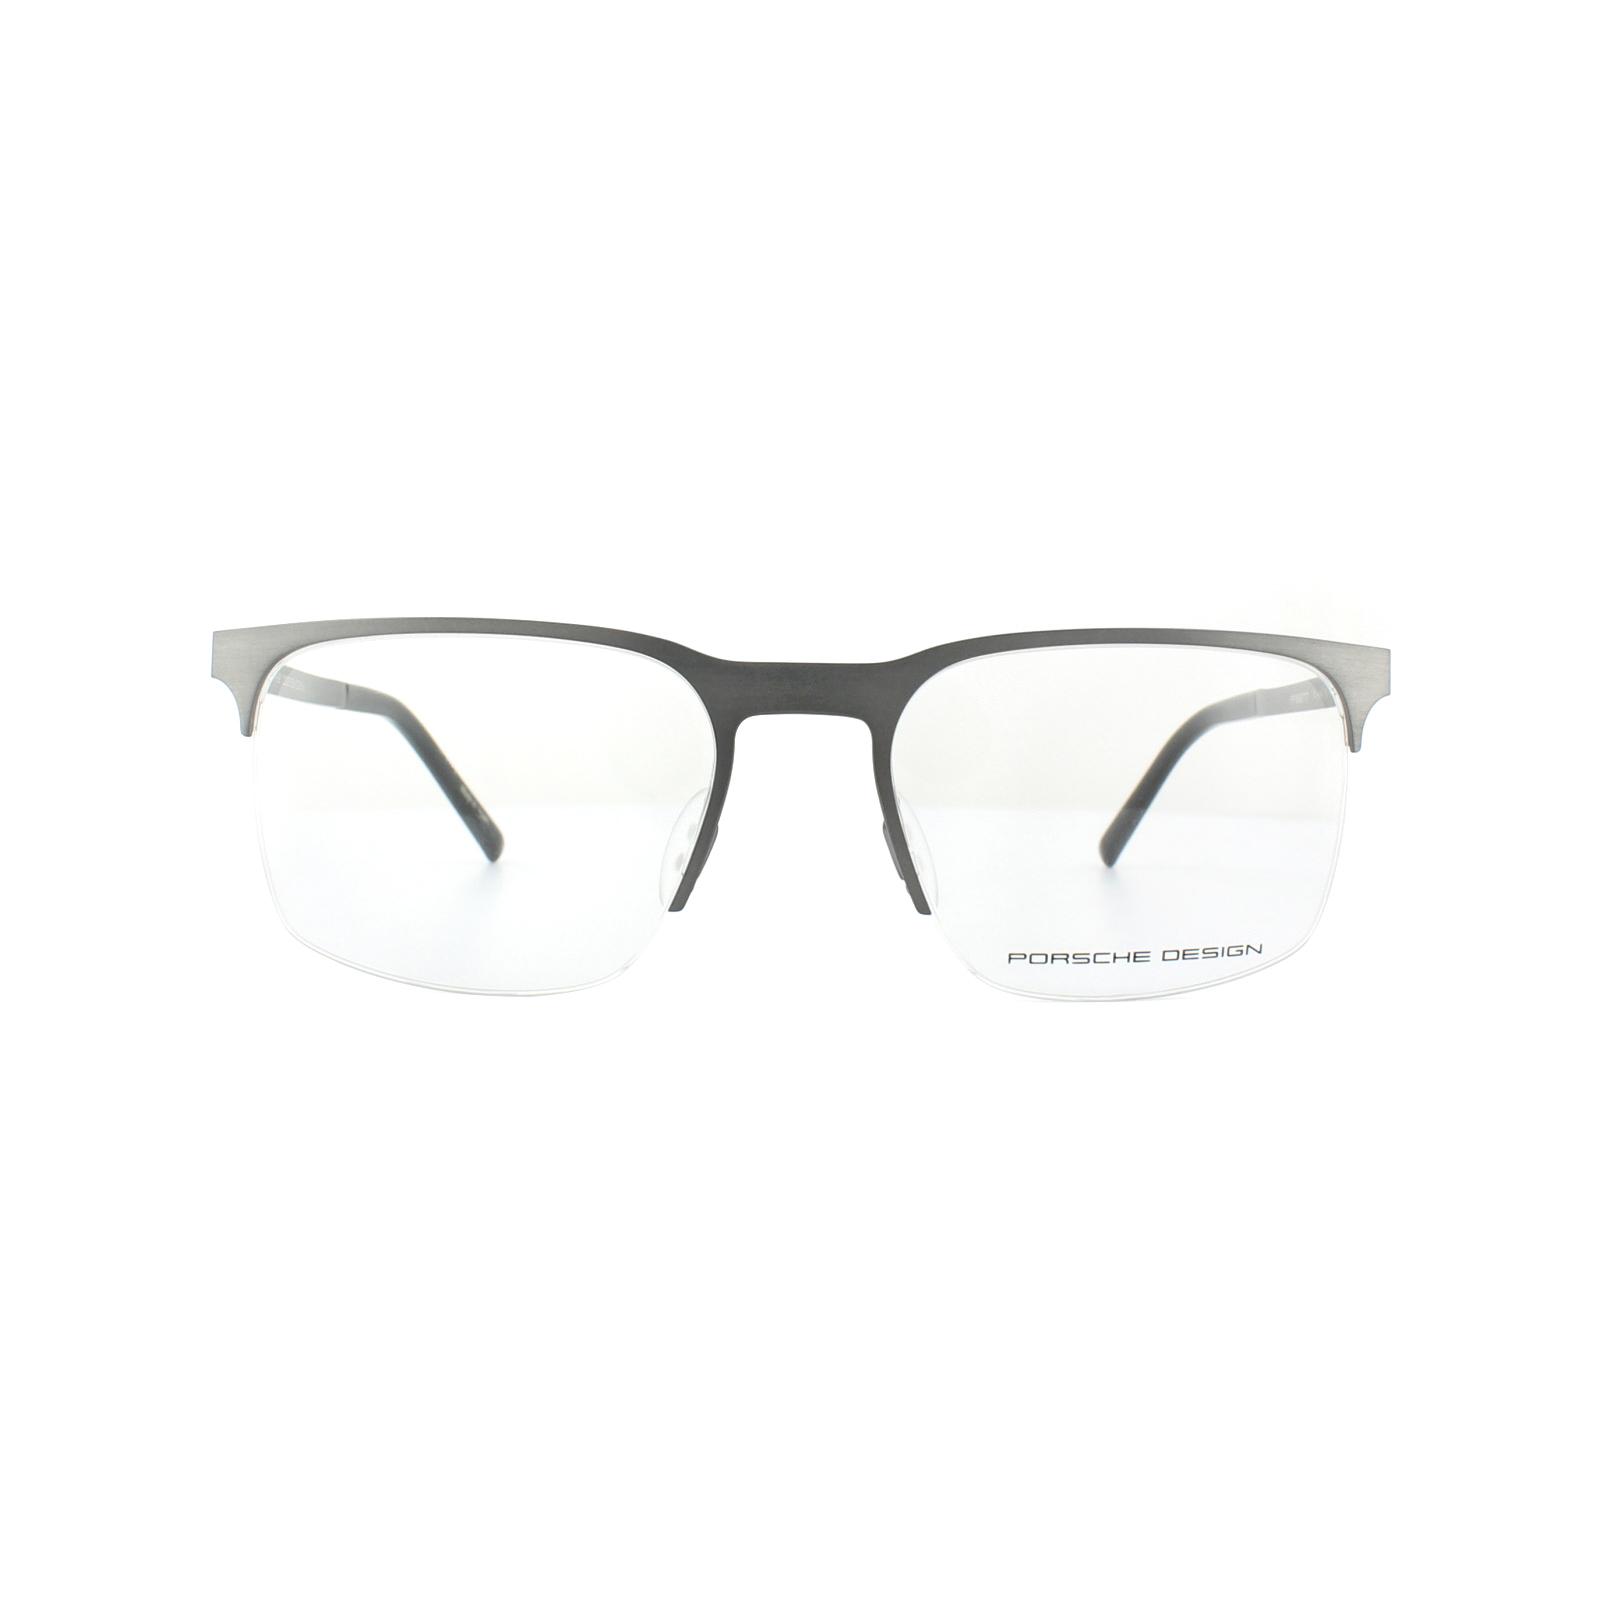 ab3f57a96d37 Porsche Design Glasses Frames P8277 B Titanium Men 4046901418083